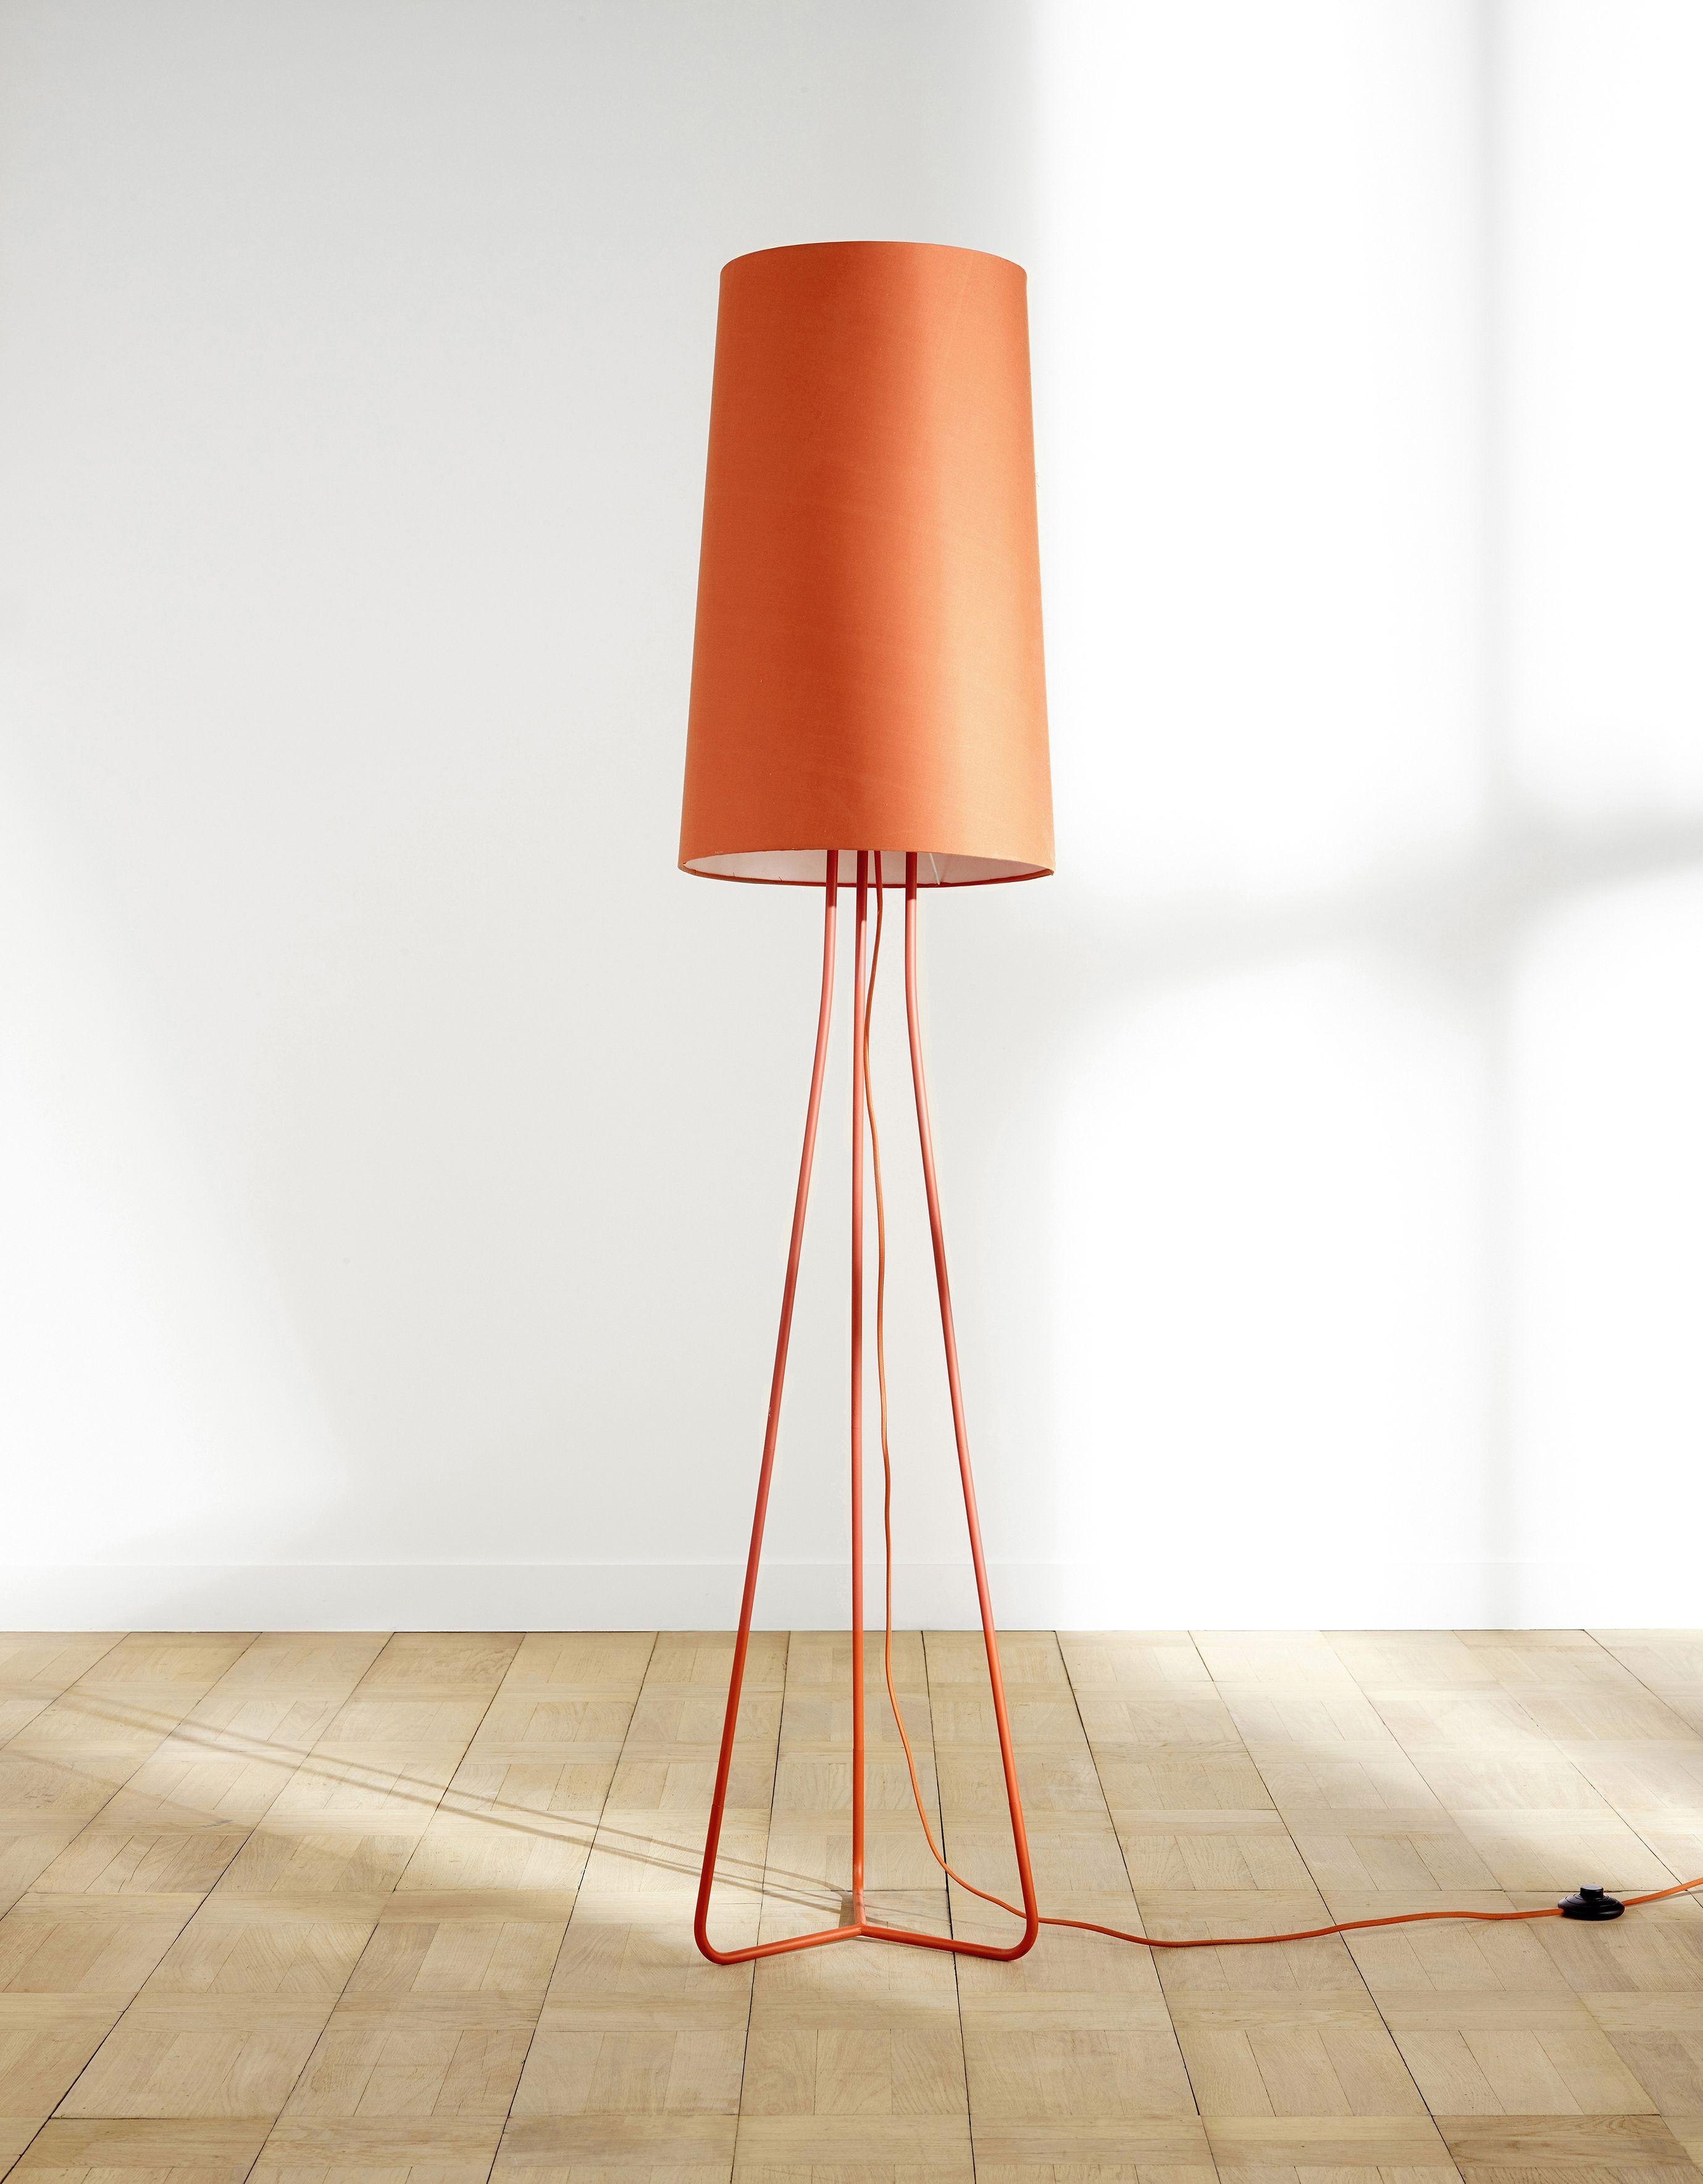 Castorama Lampadaire Lampe Multicolore Pas Cher Royalegemmes